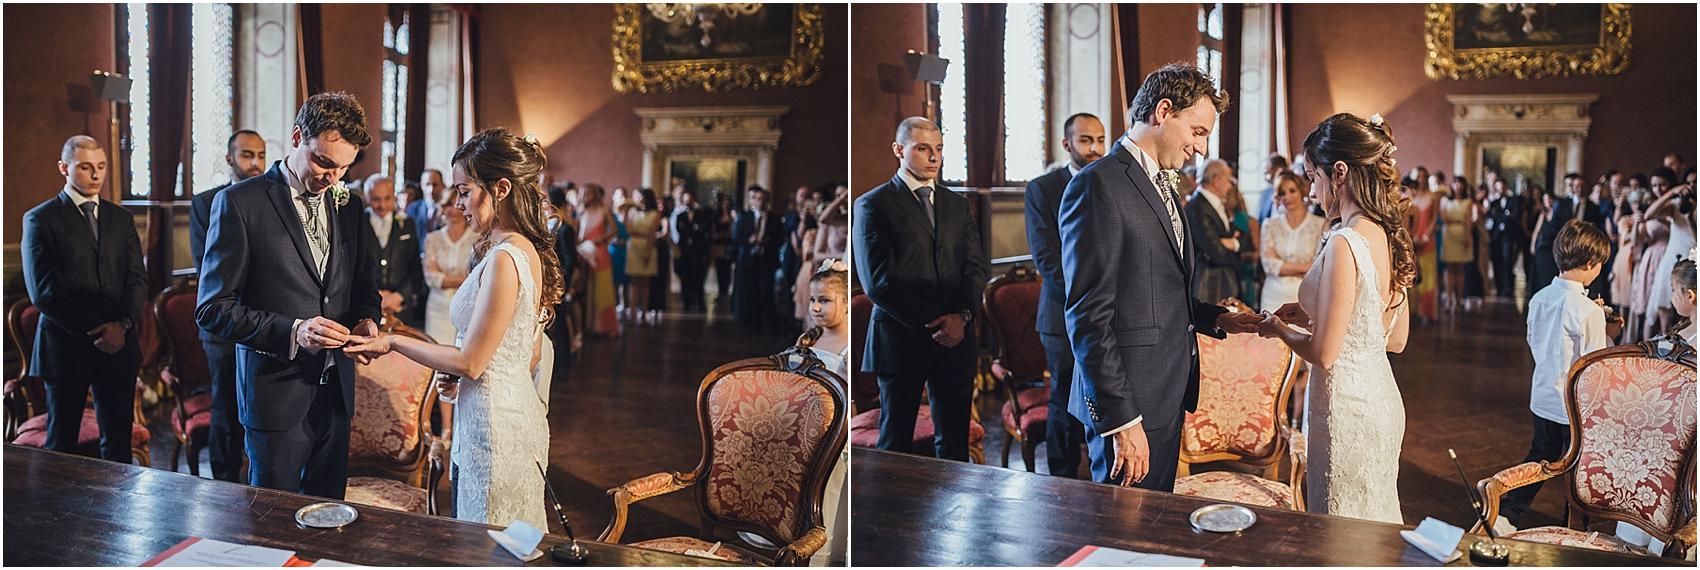 destination-wedding-photographer-tuscany_0164